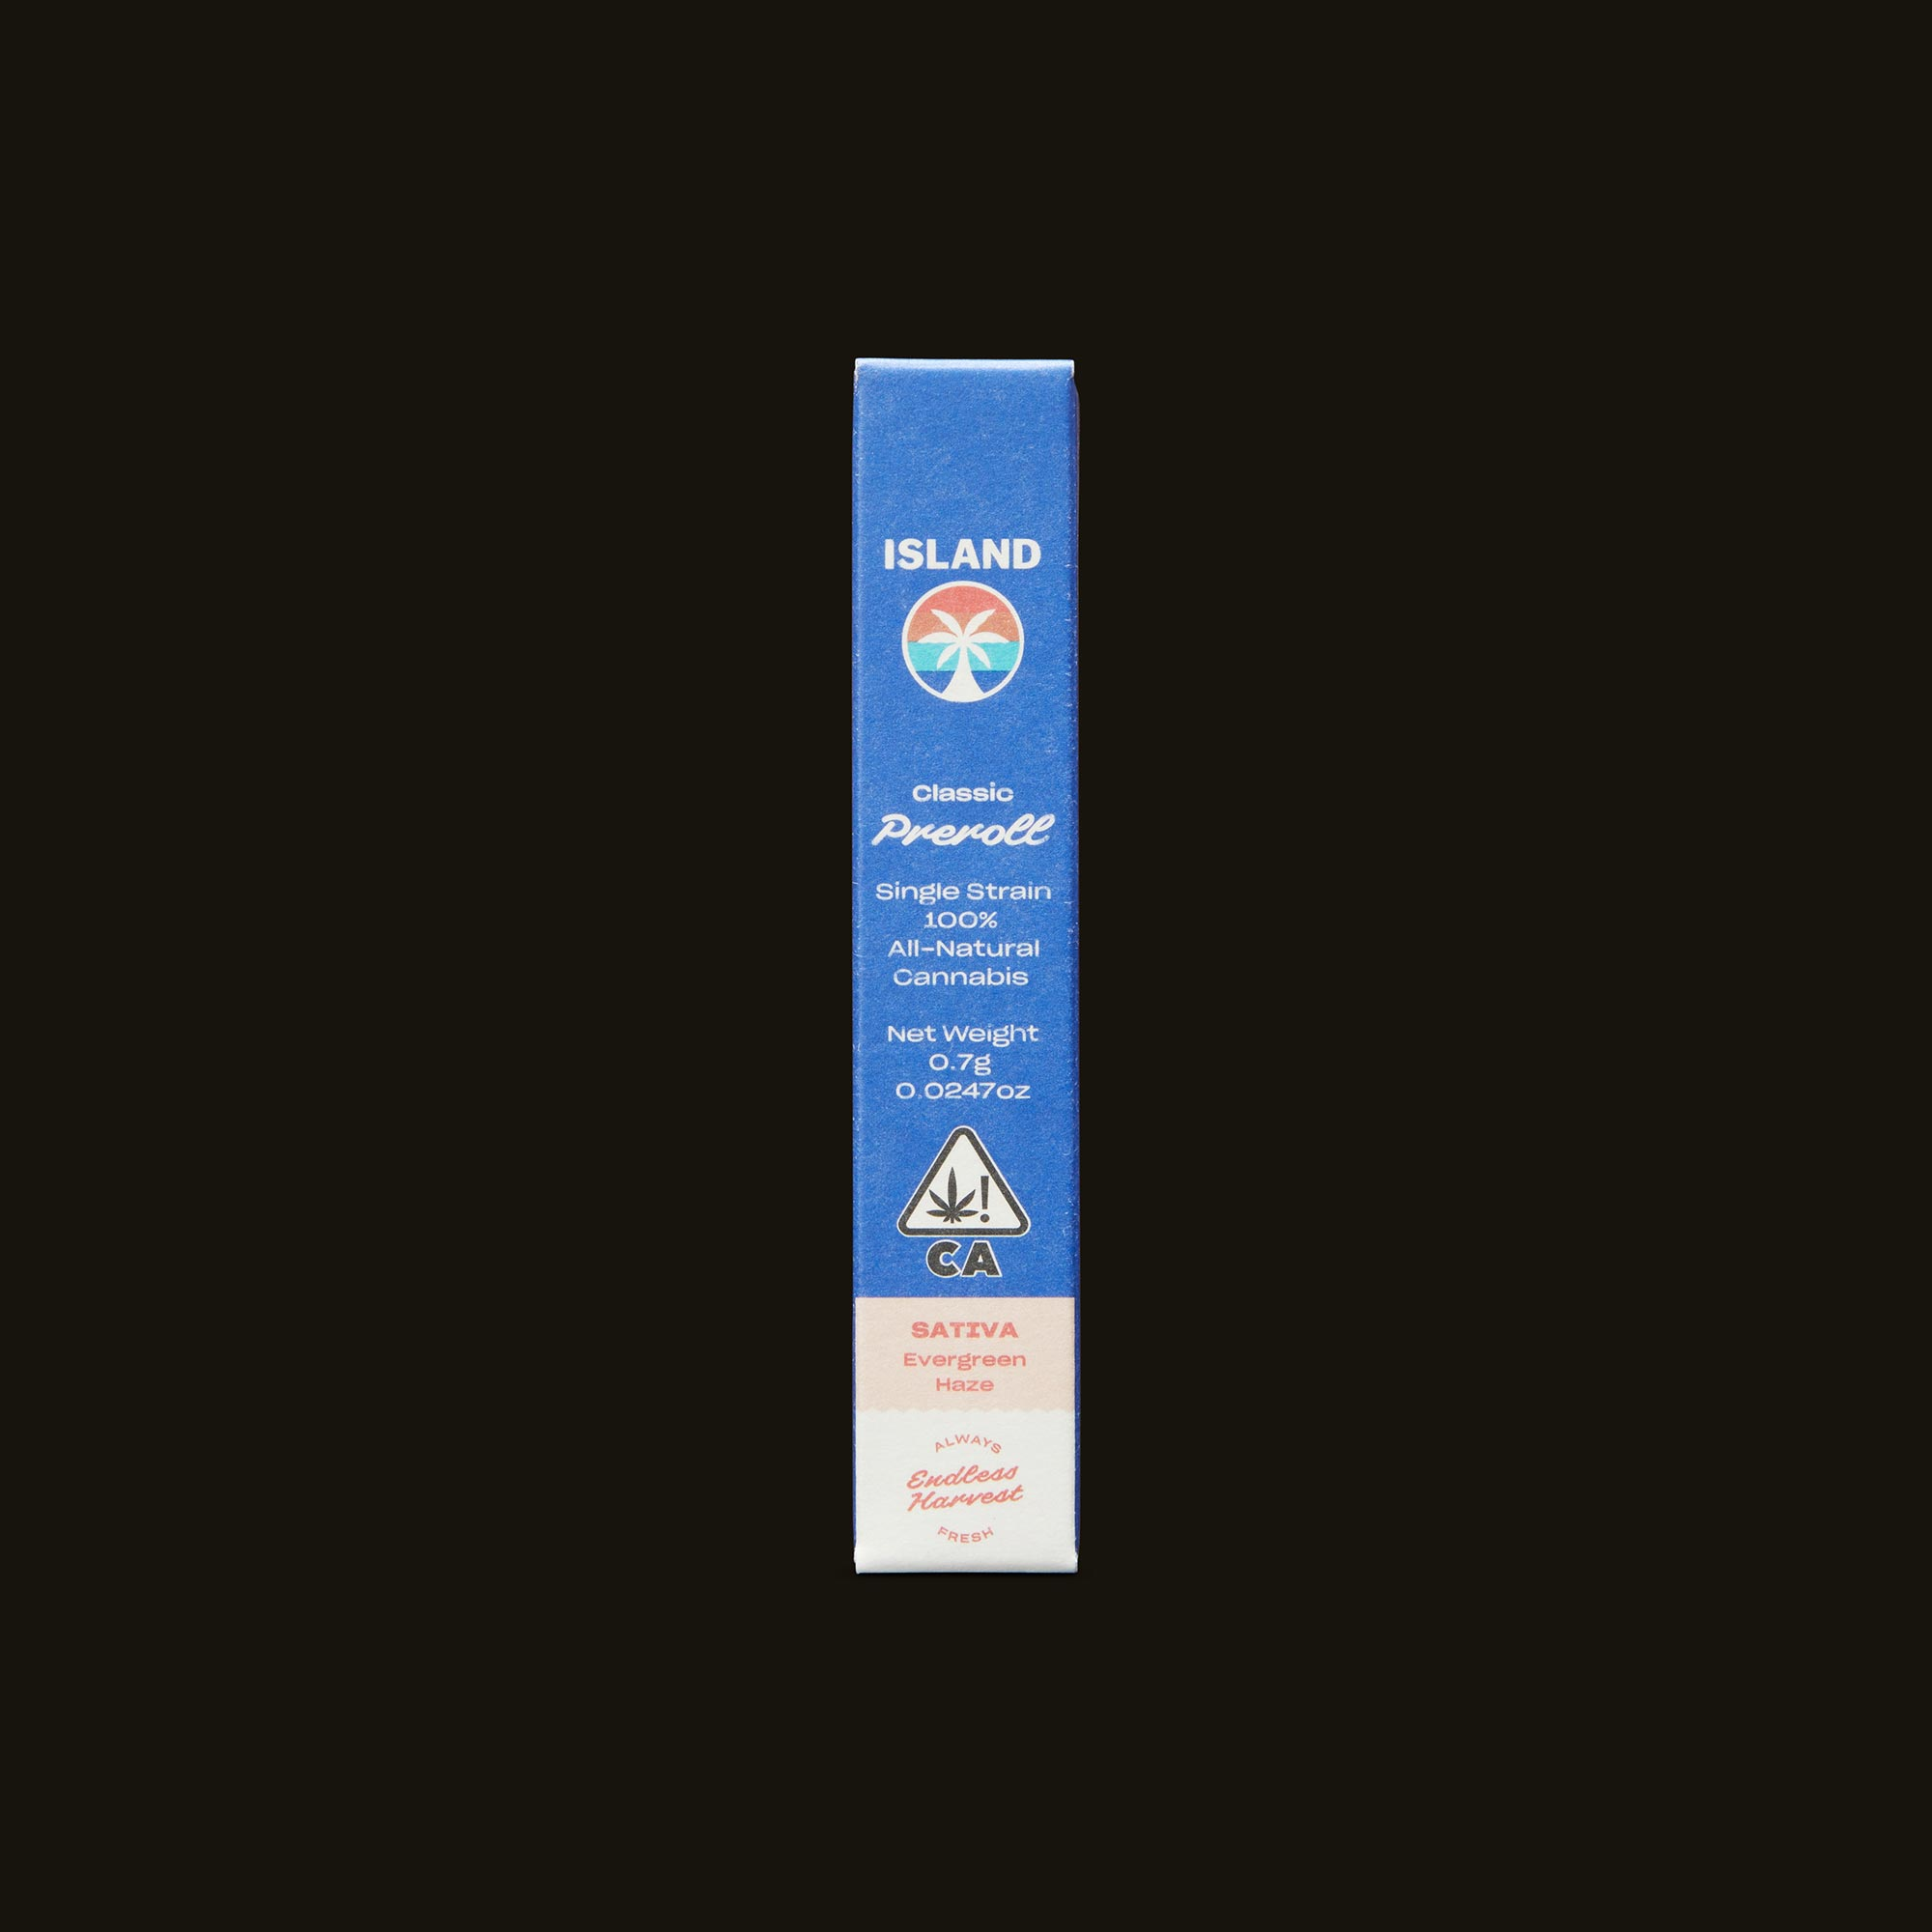 Island Evergreen Haze Classic Front Packaging